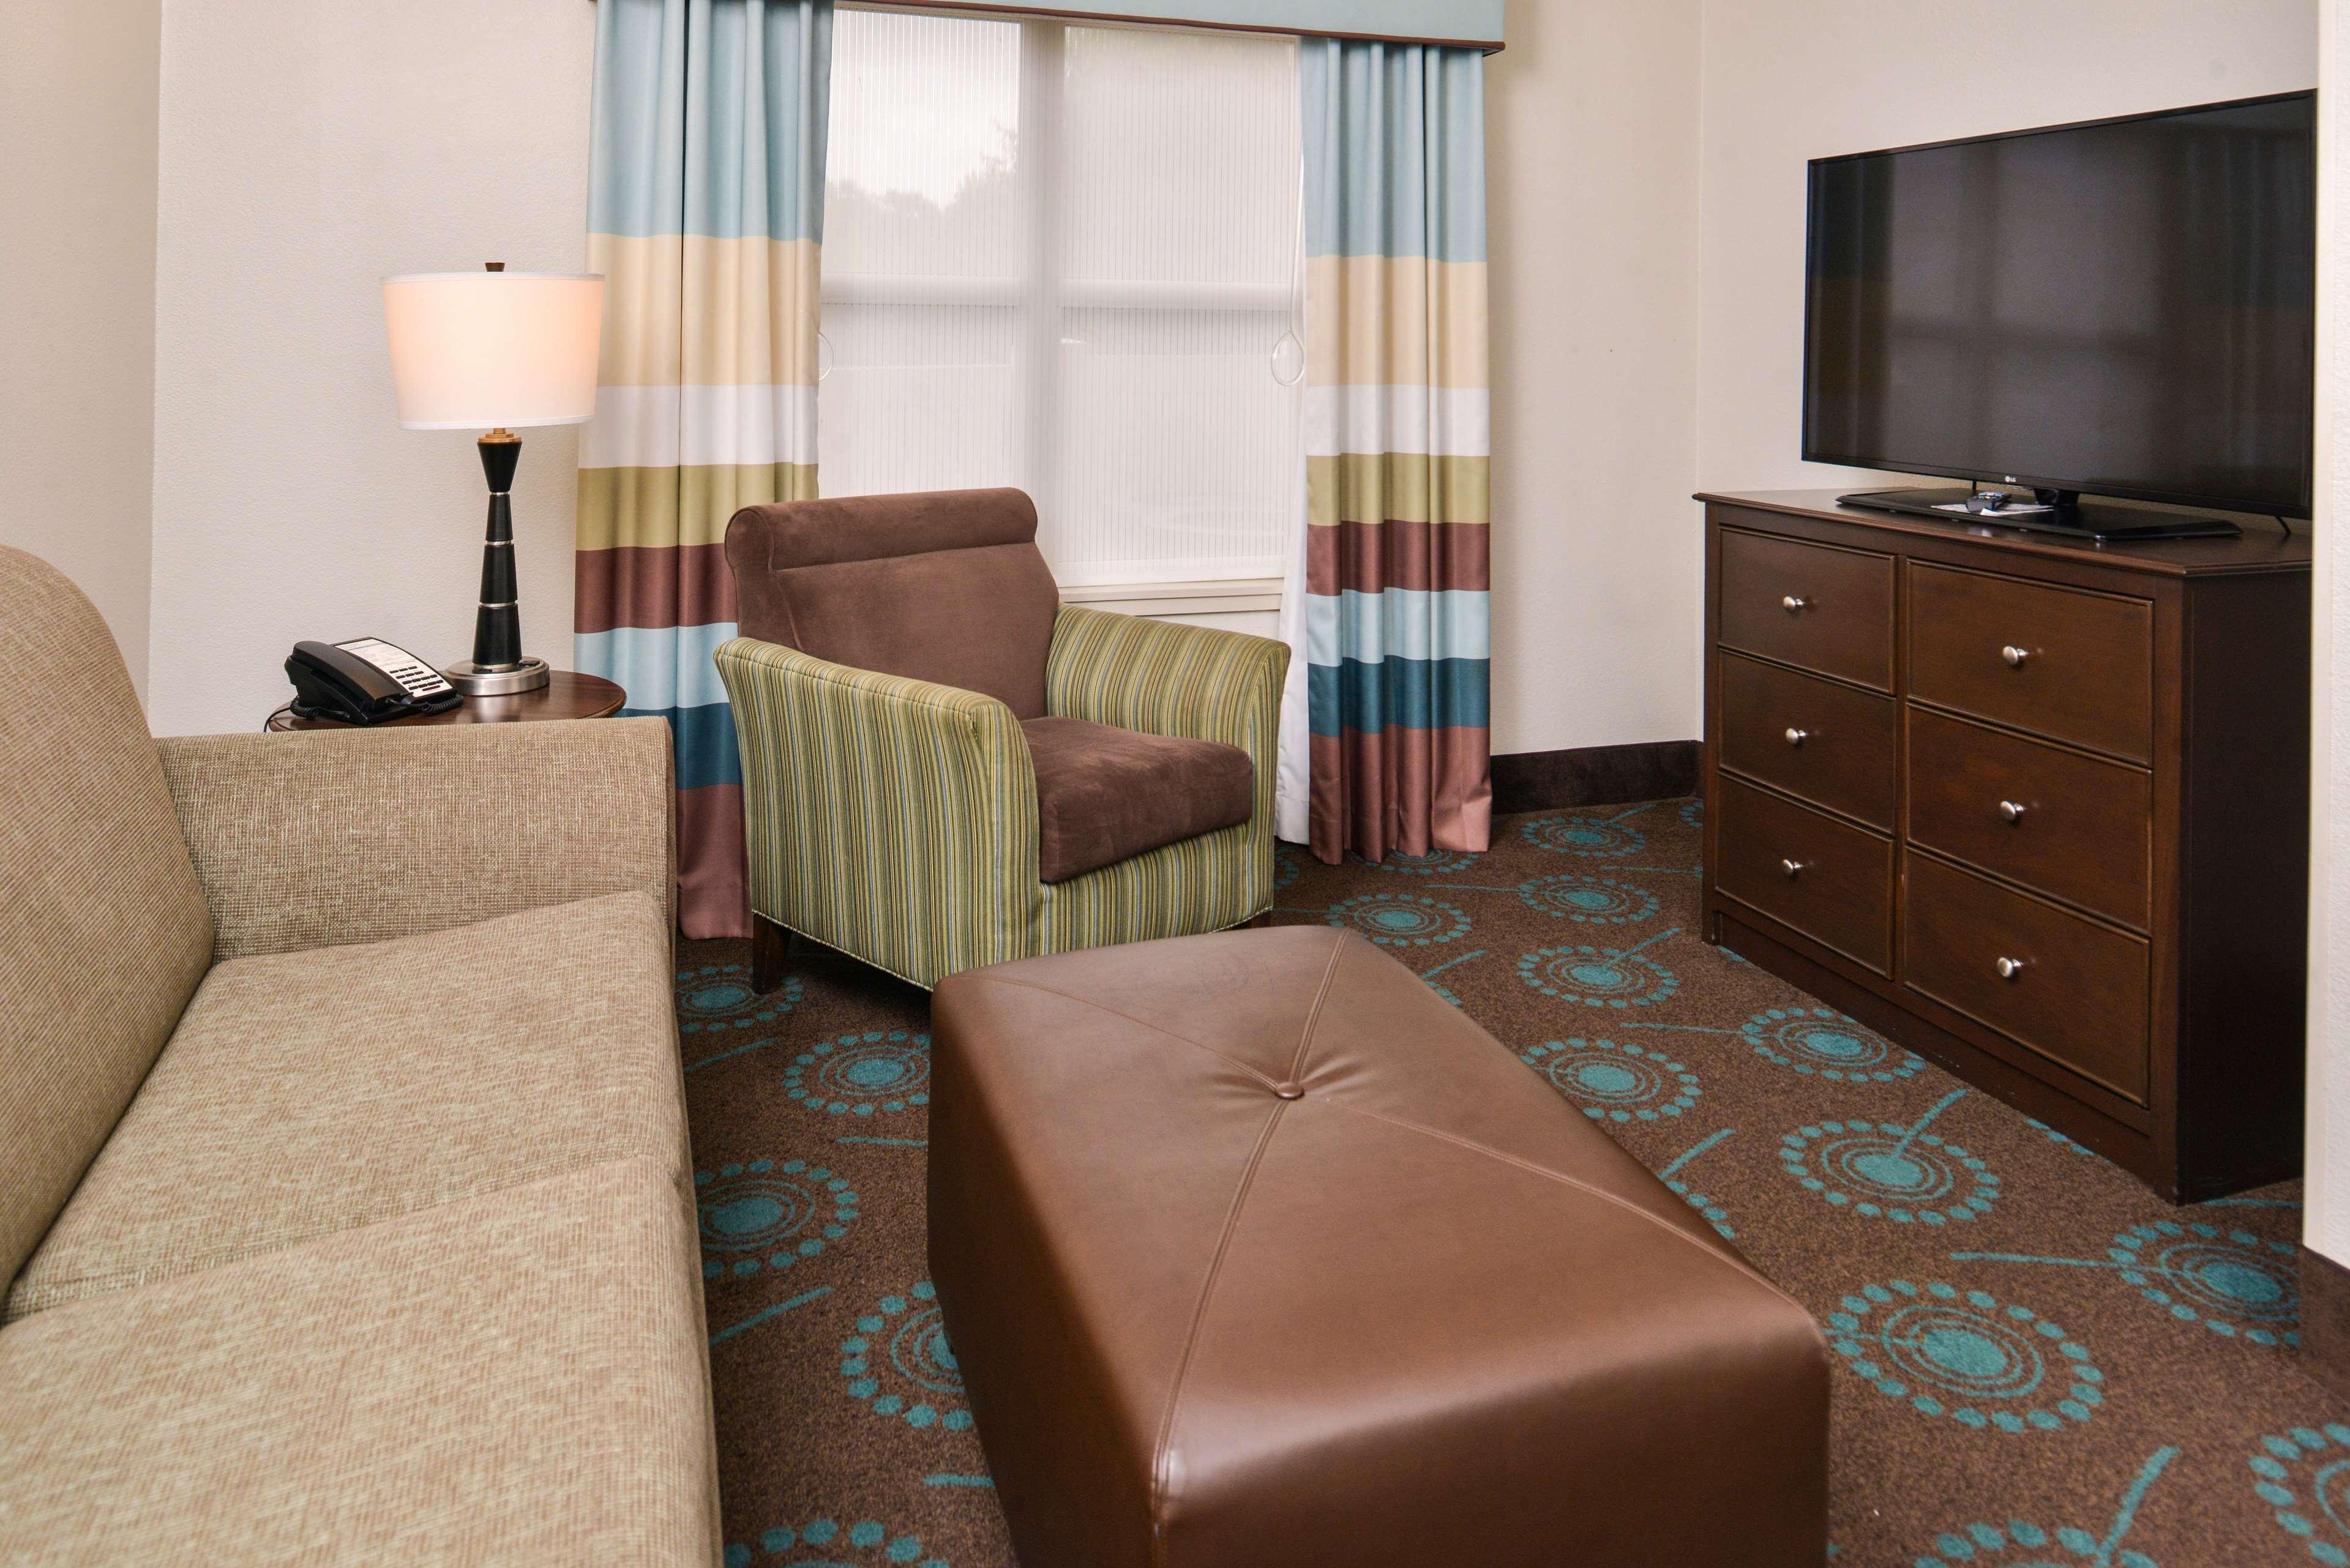 Hampton Inn & Suites Newport News (Oyster Point) image 42